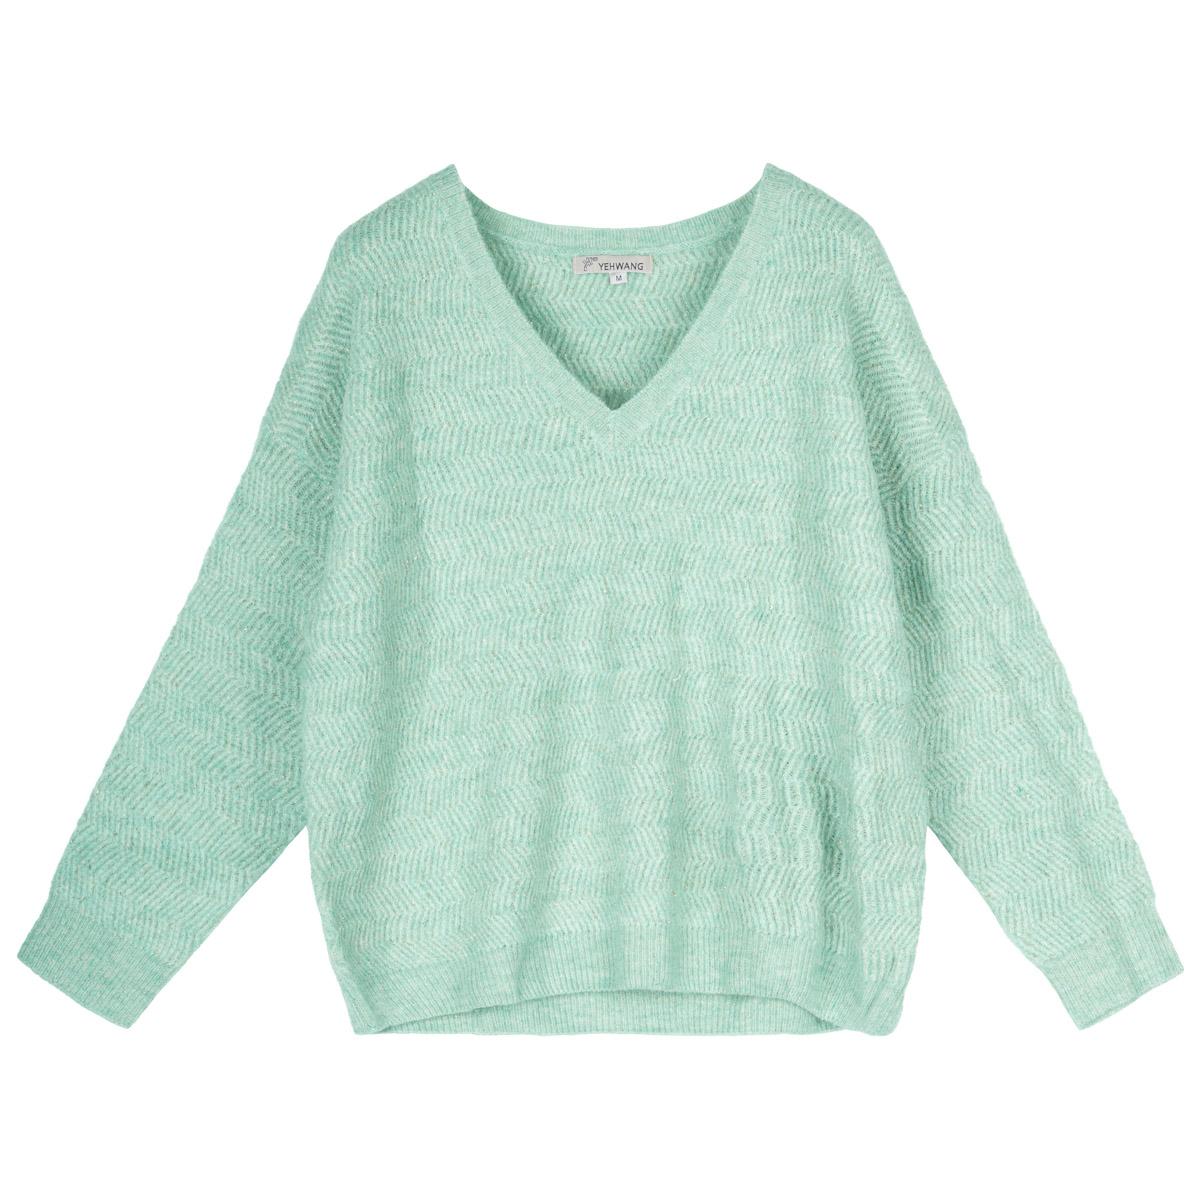 Sweatshirt caro